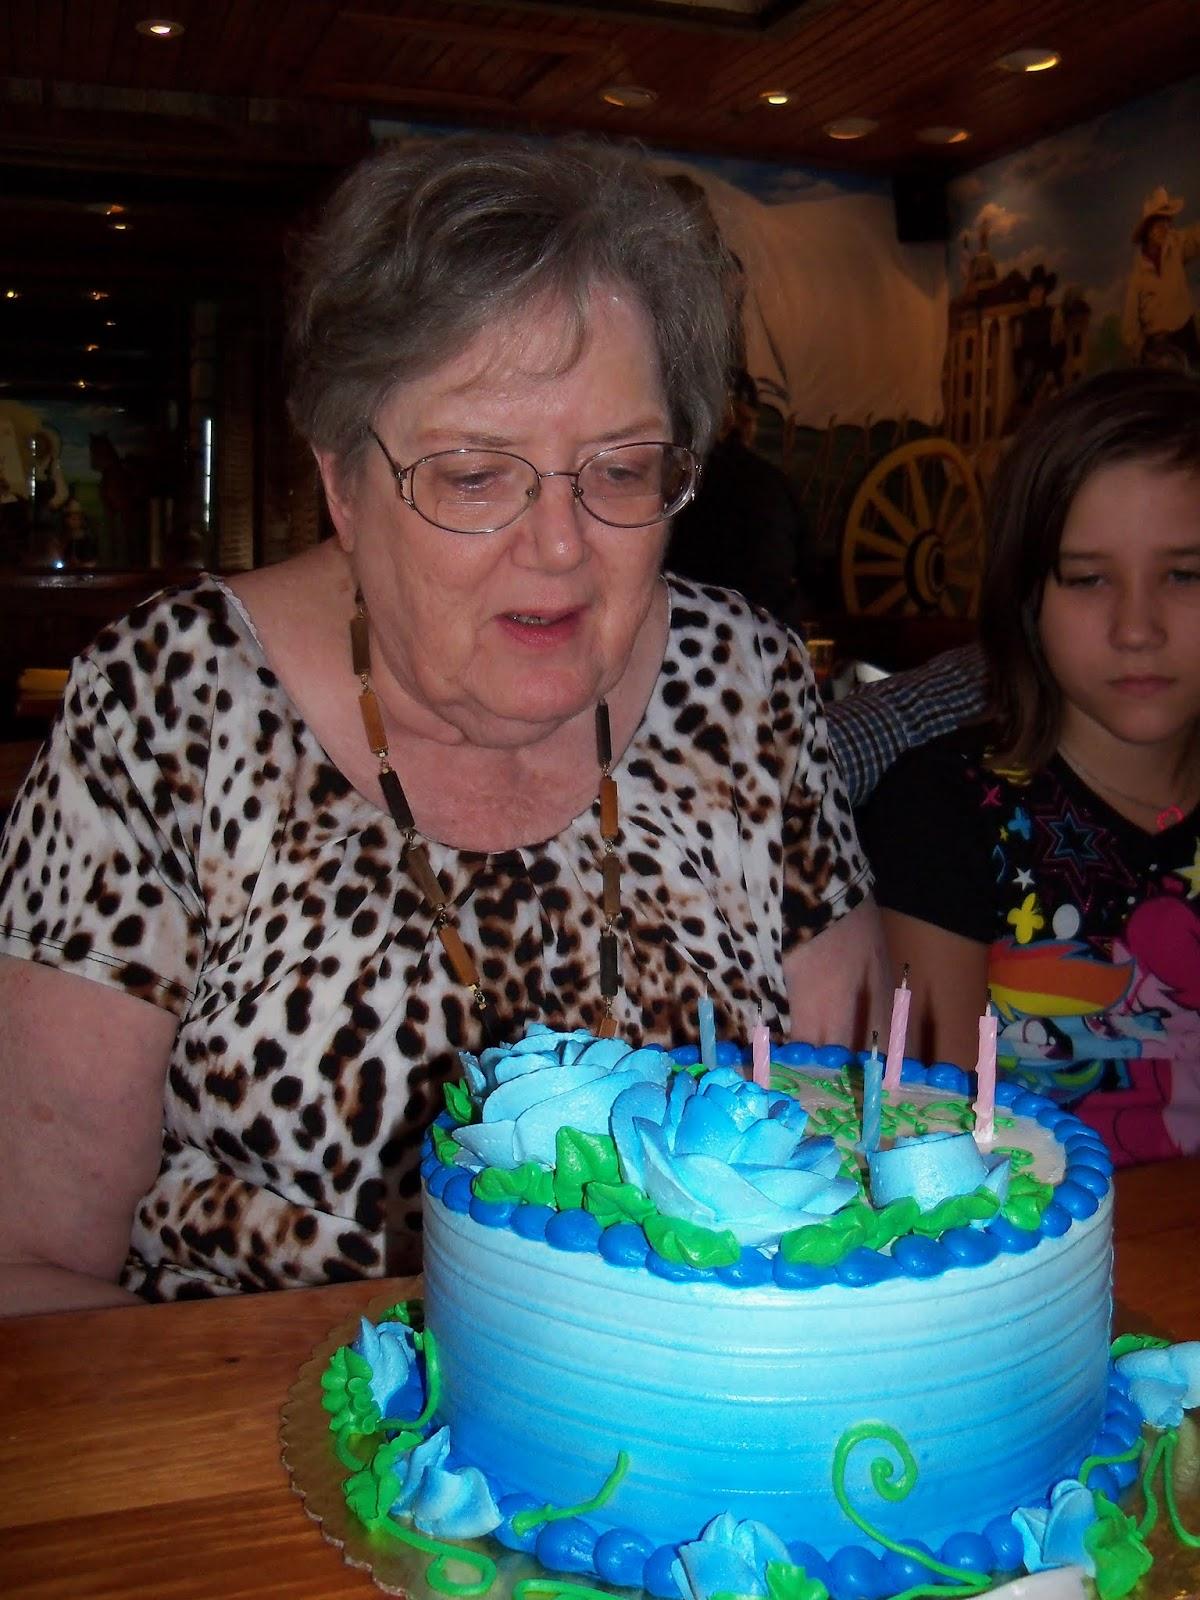 Moms 70th Birthday and Labor Day - 117_0138.JPG